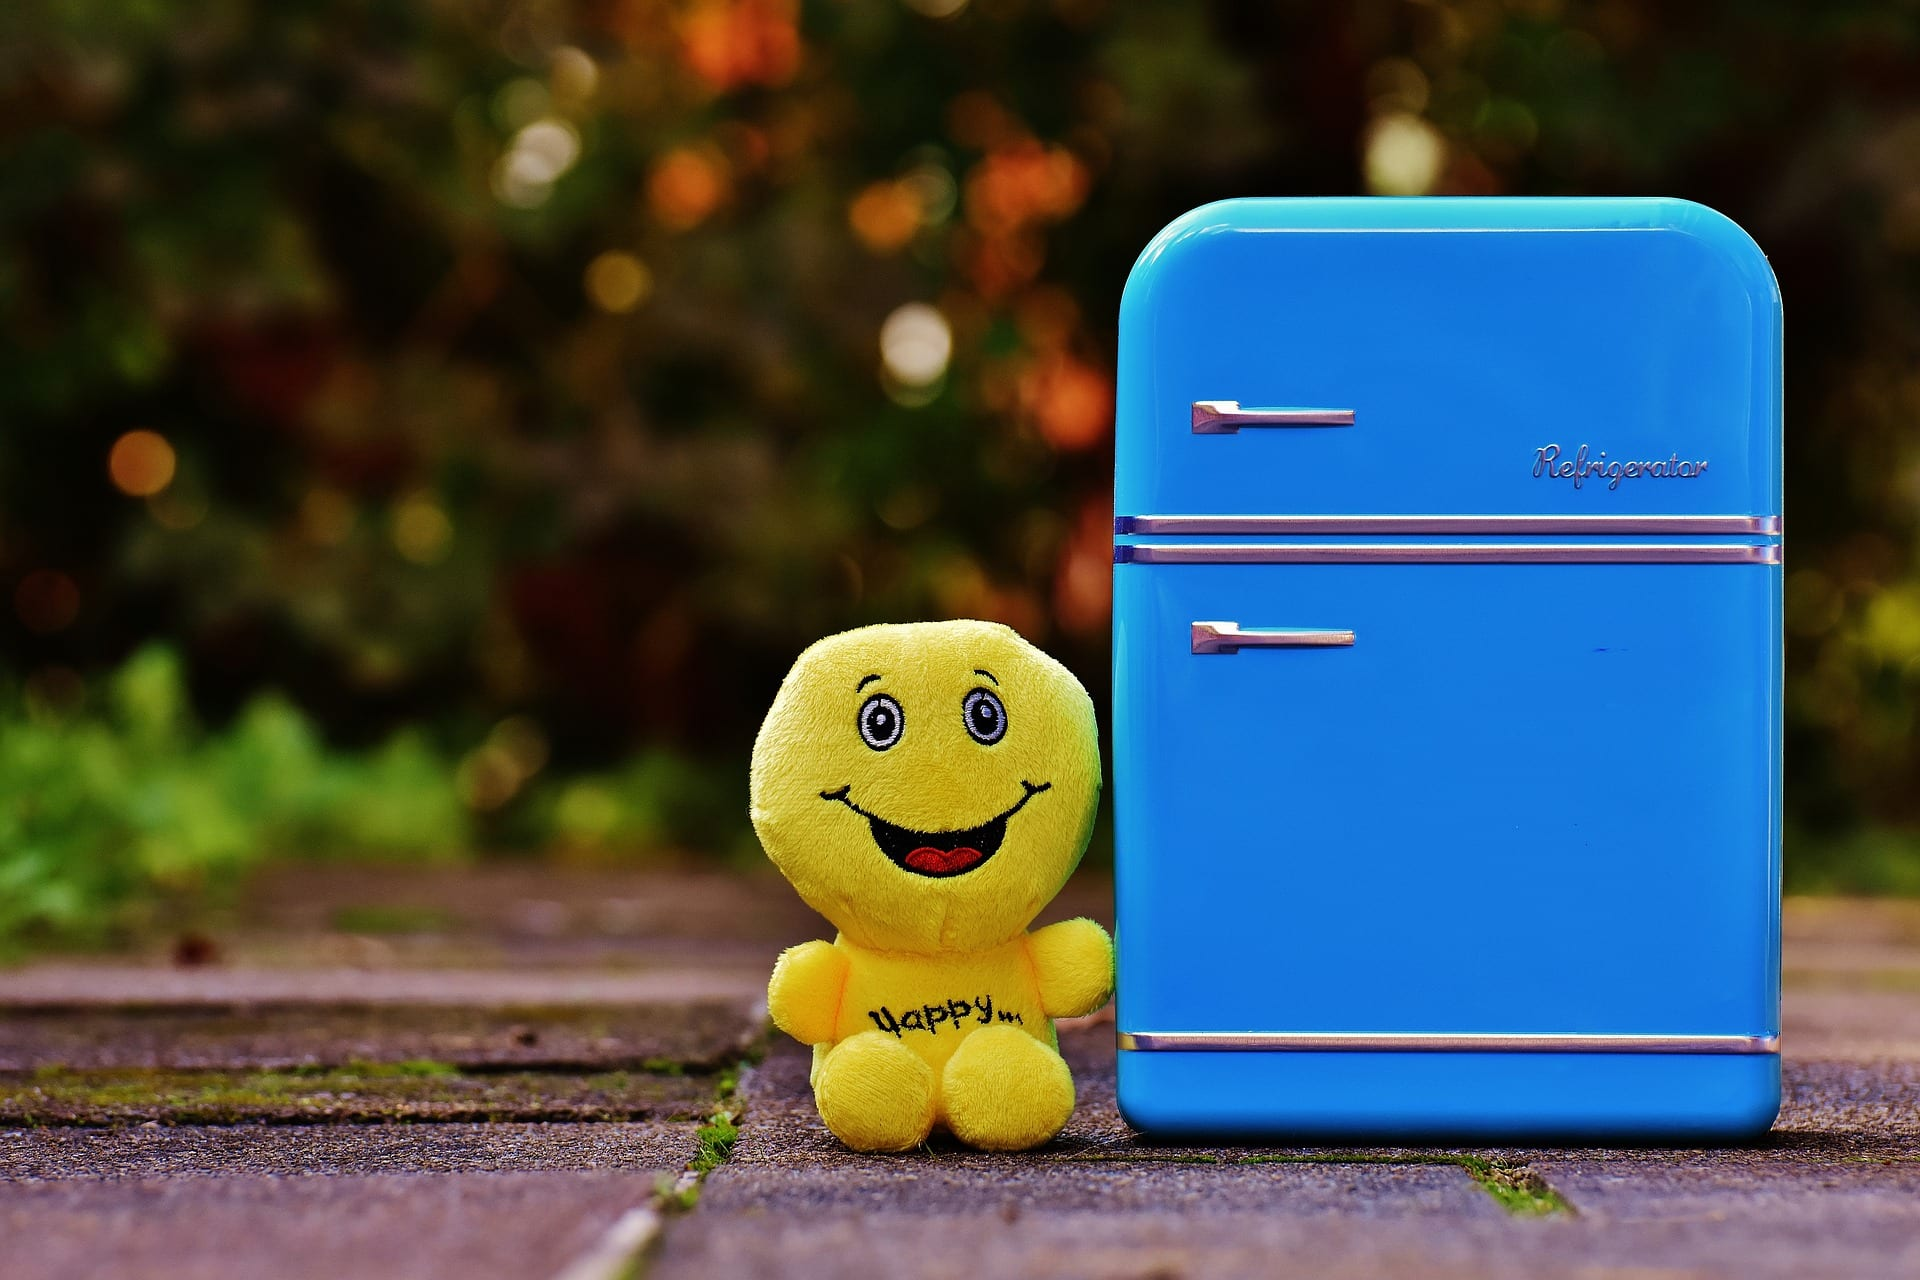 Smiling doll next to blue fridge